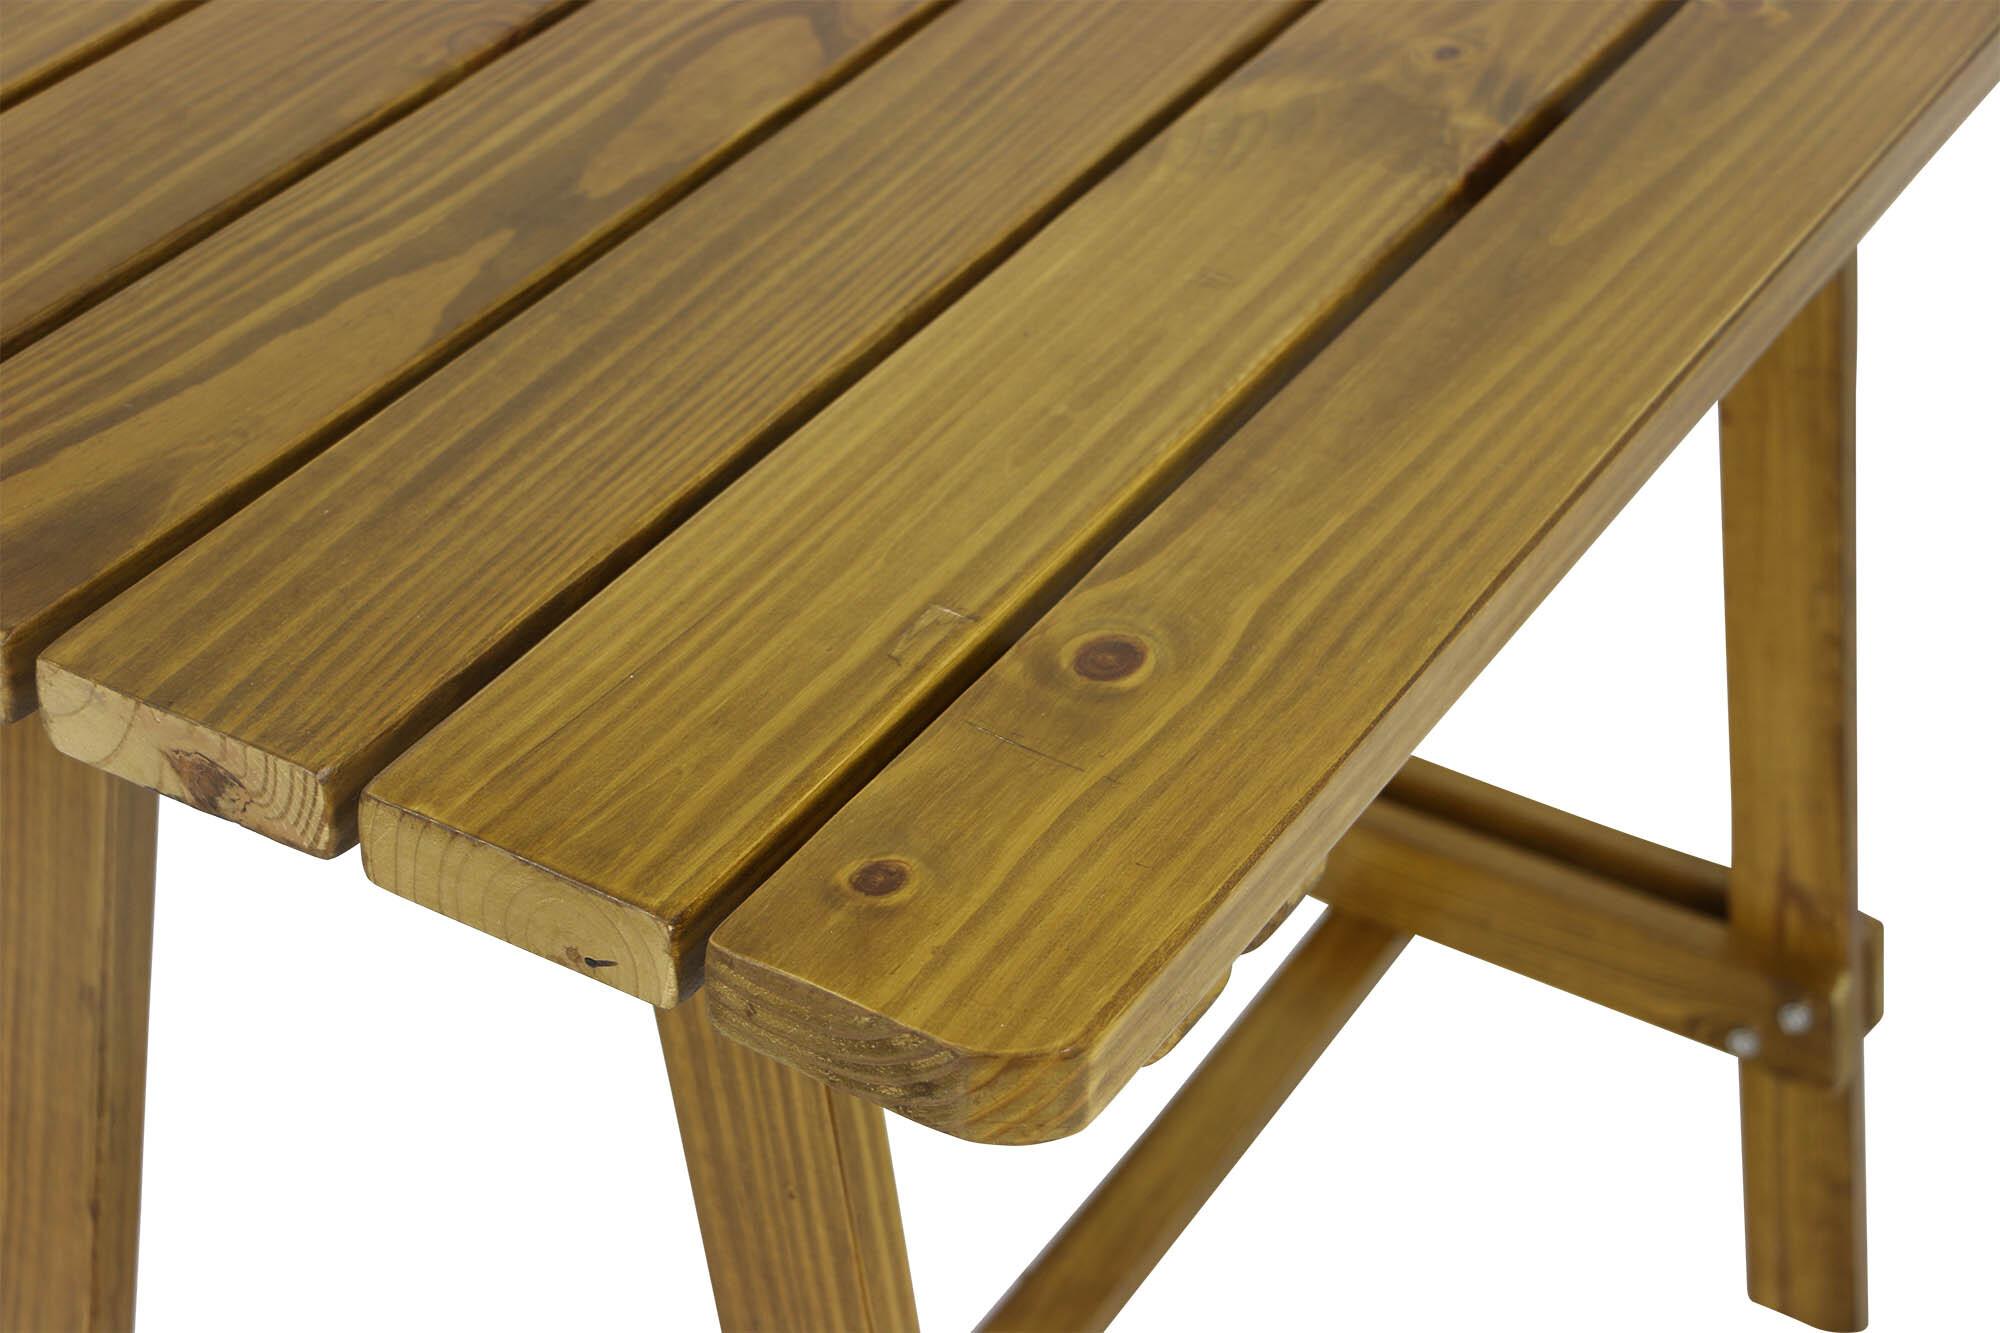 Apache Wooden Bar Table. Regular Price: S$368.90